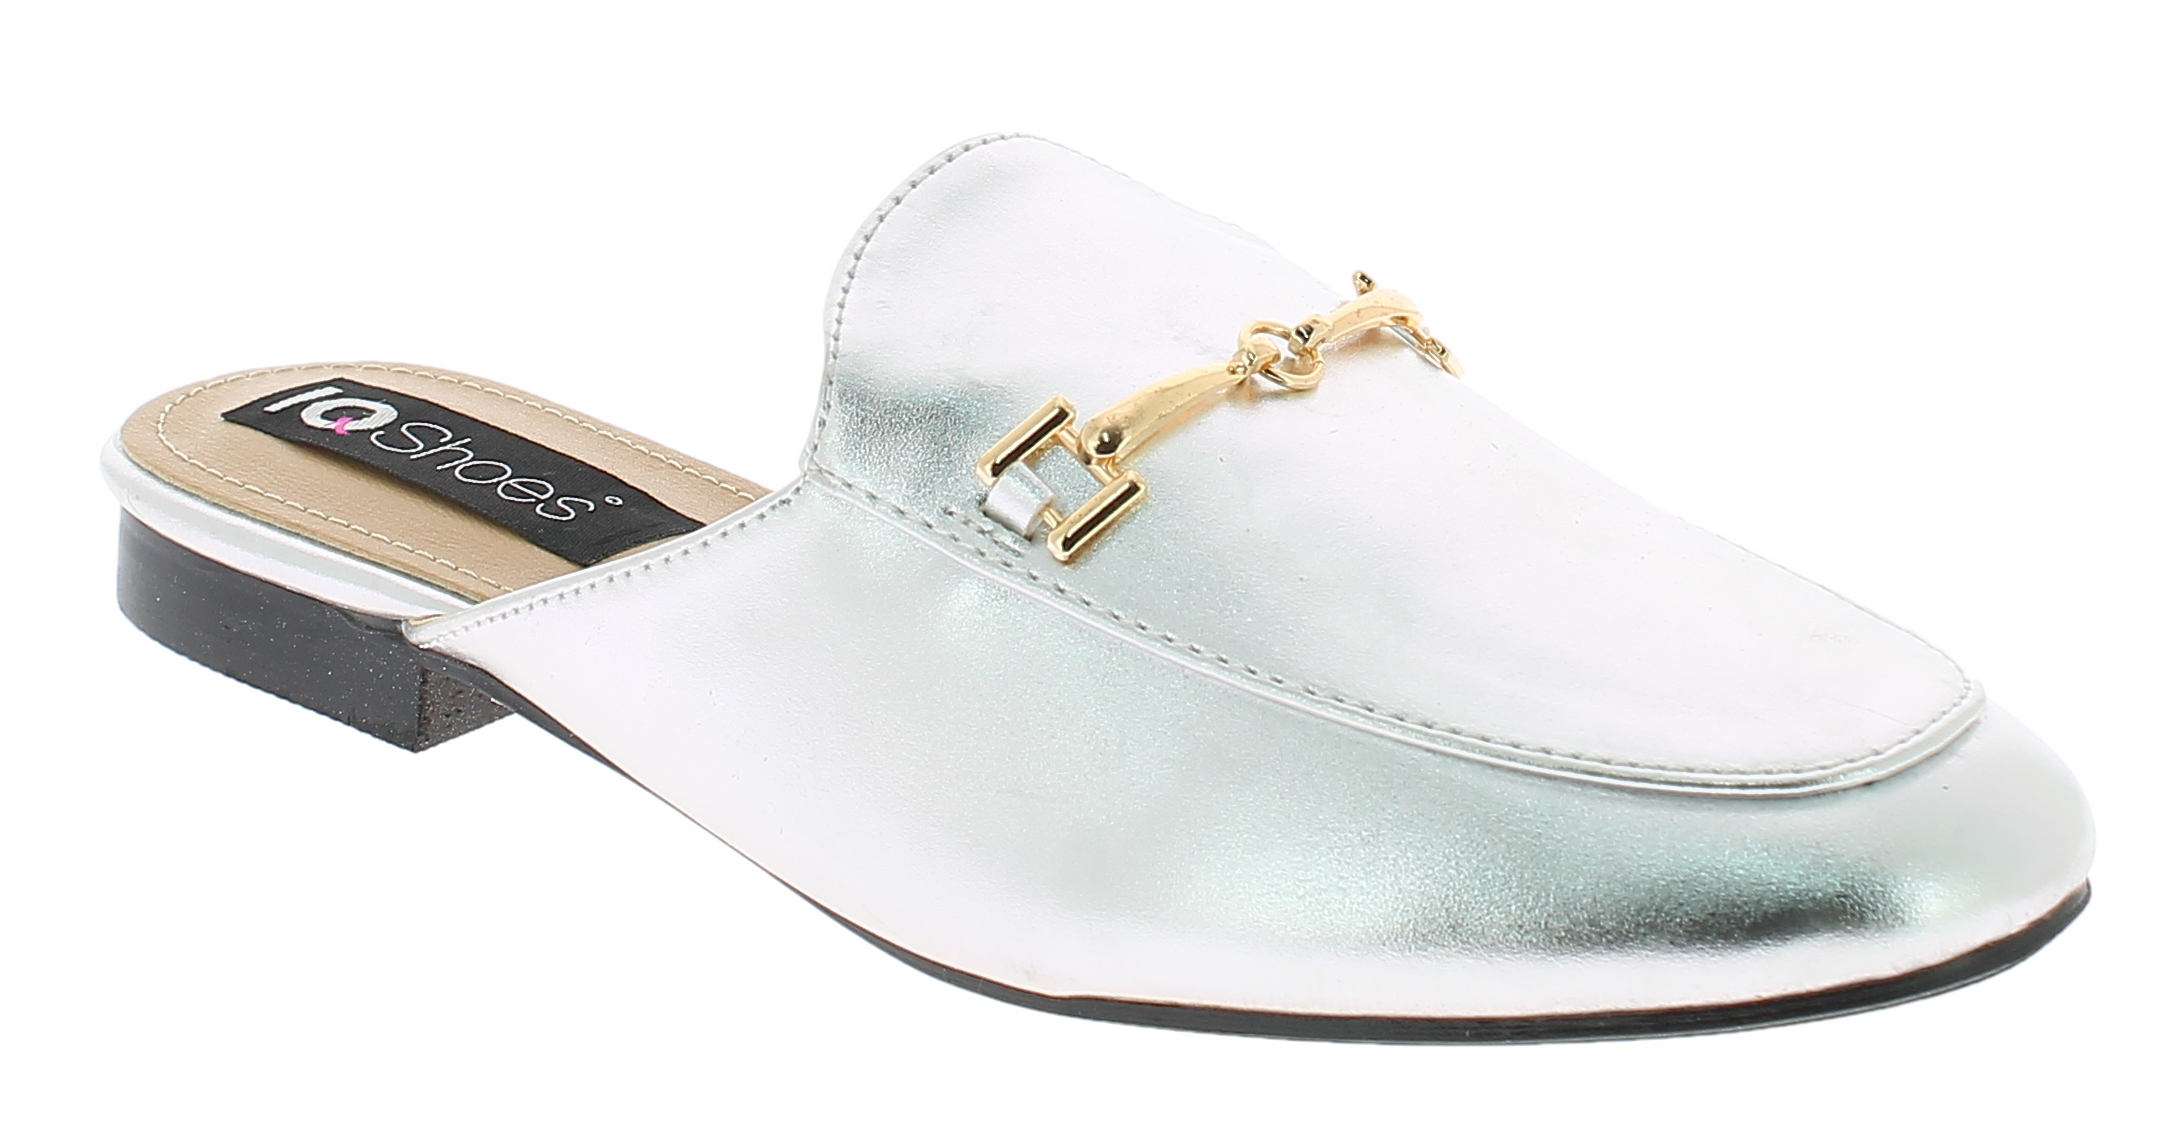 IQSHOES Γυναικεία Σανδάλια 1NN17070 Ασημί - IqShoes - 1NN-17070 SILVER-silver-36 παπούτσια  γυναικεία σανδάλια   πέδιλα